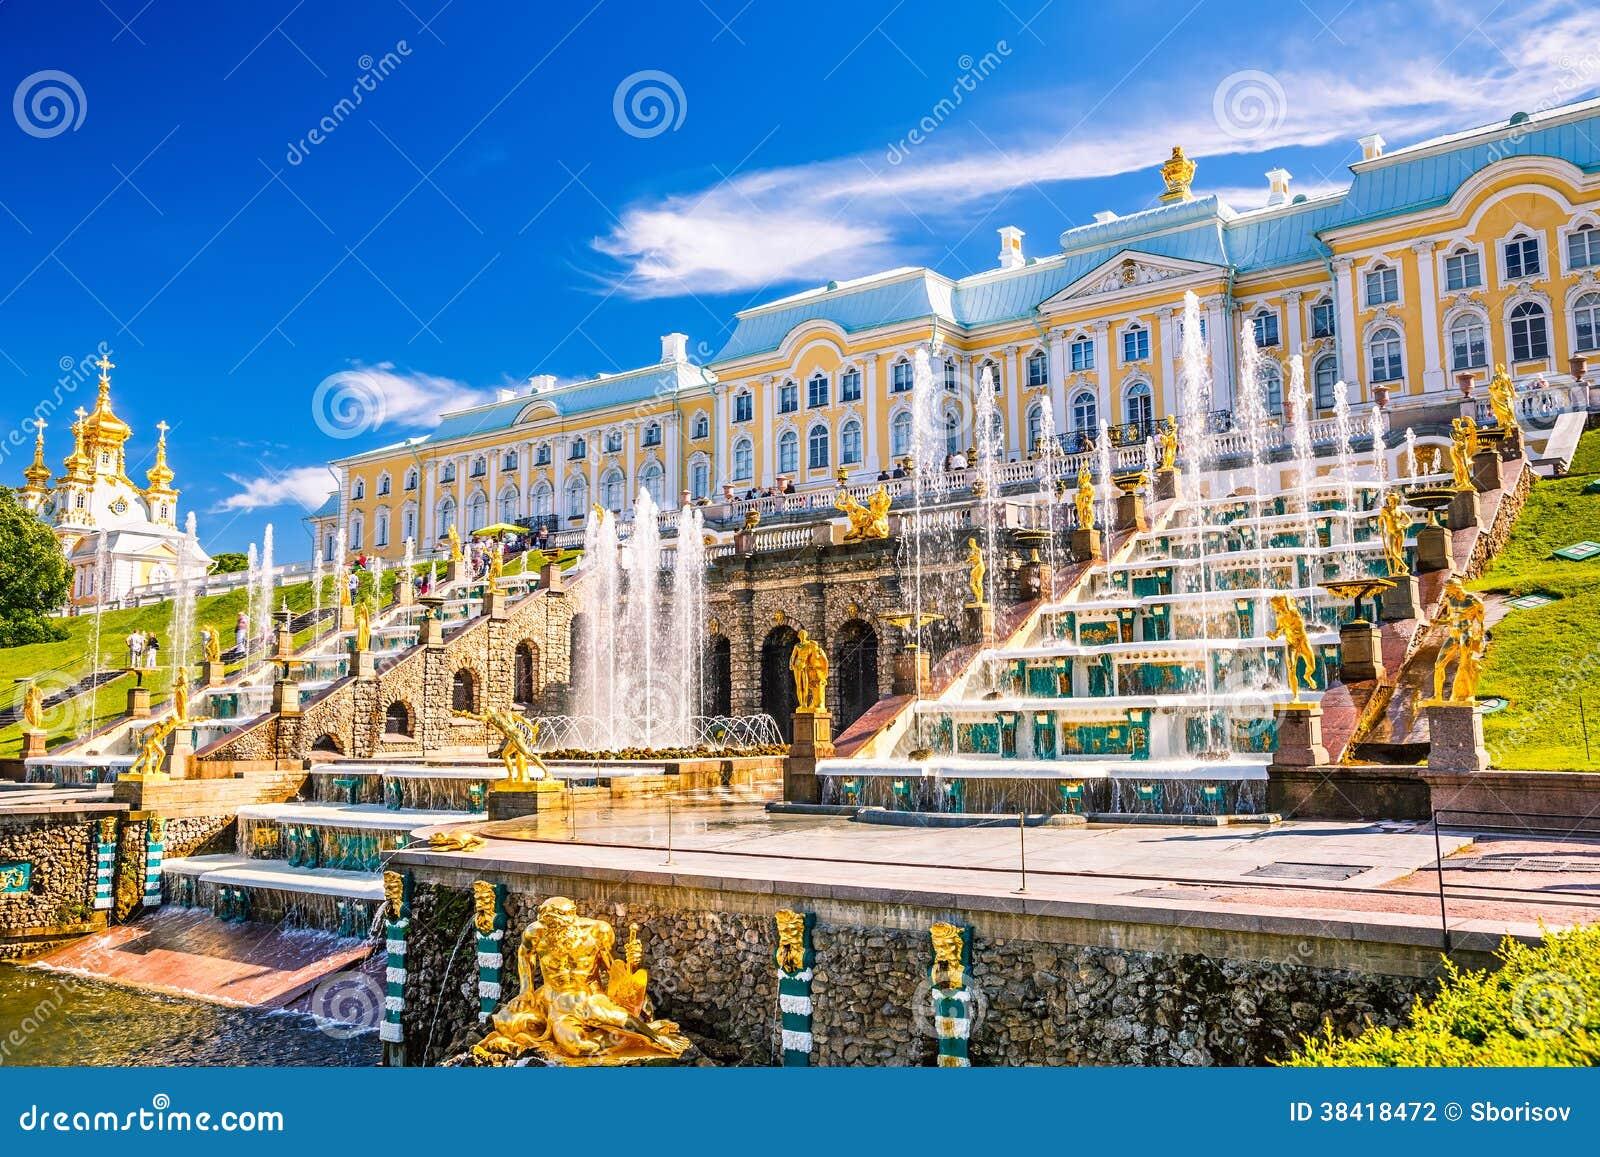 Storslagen kaskad i Peterhof, St Petersburg